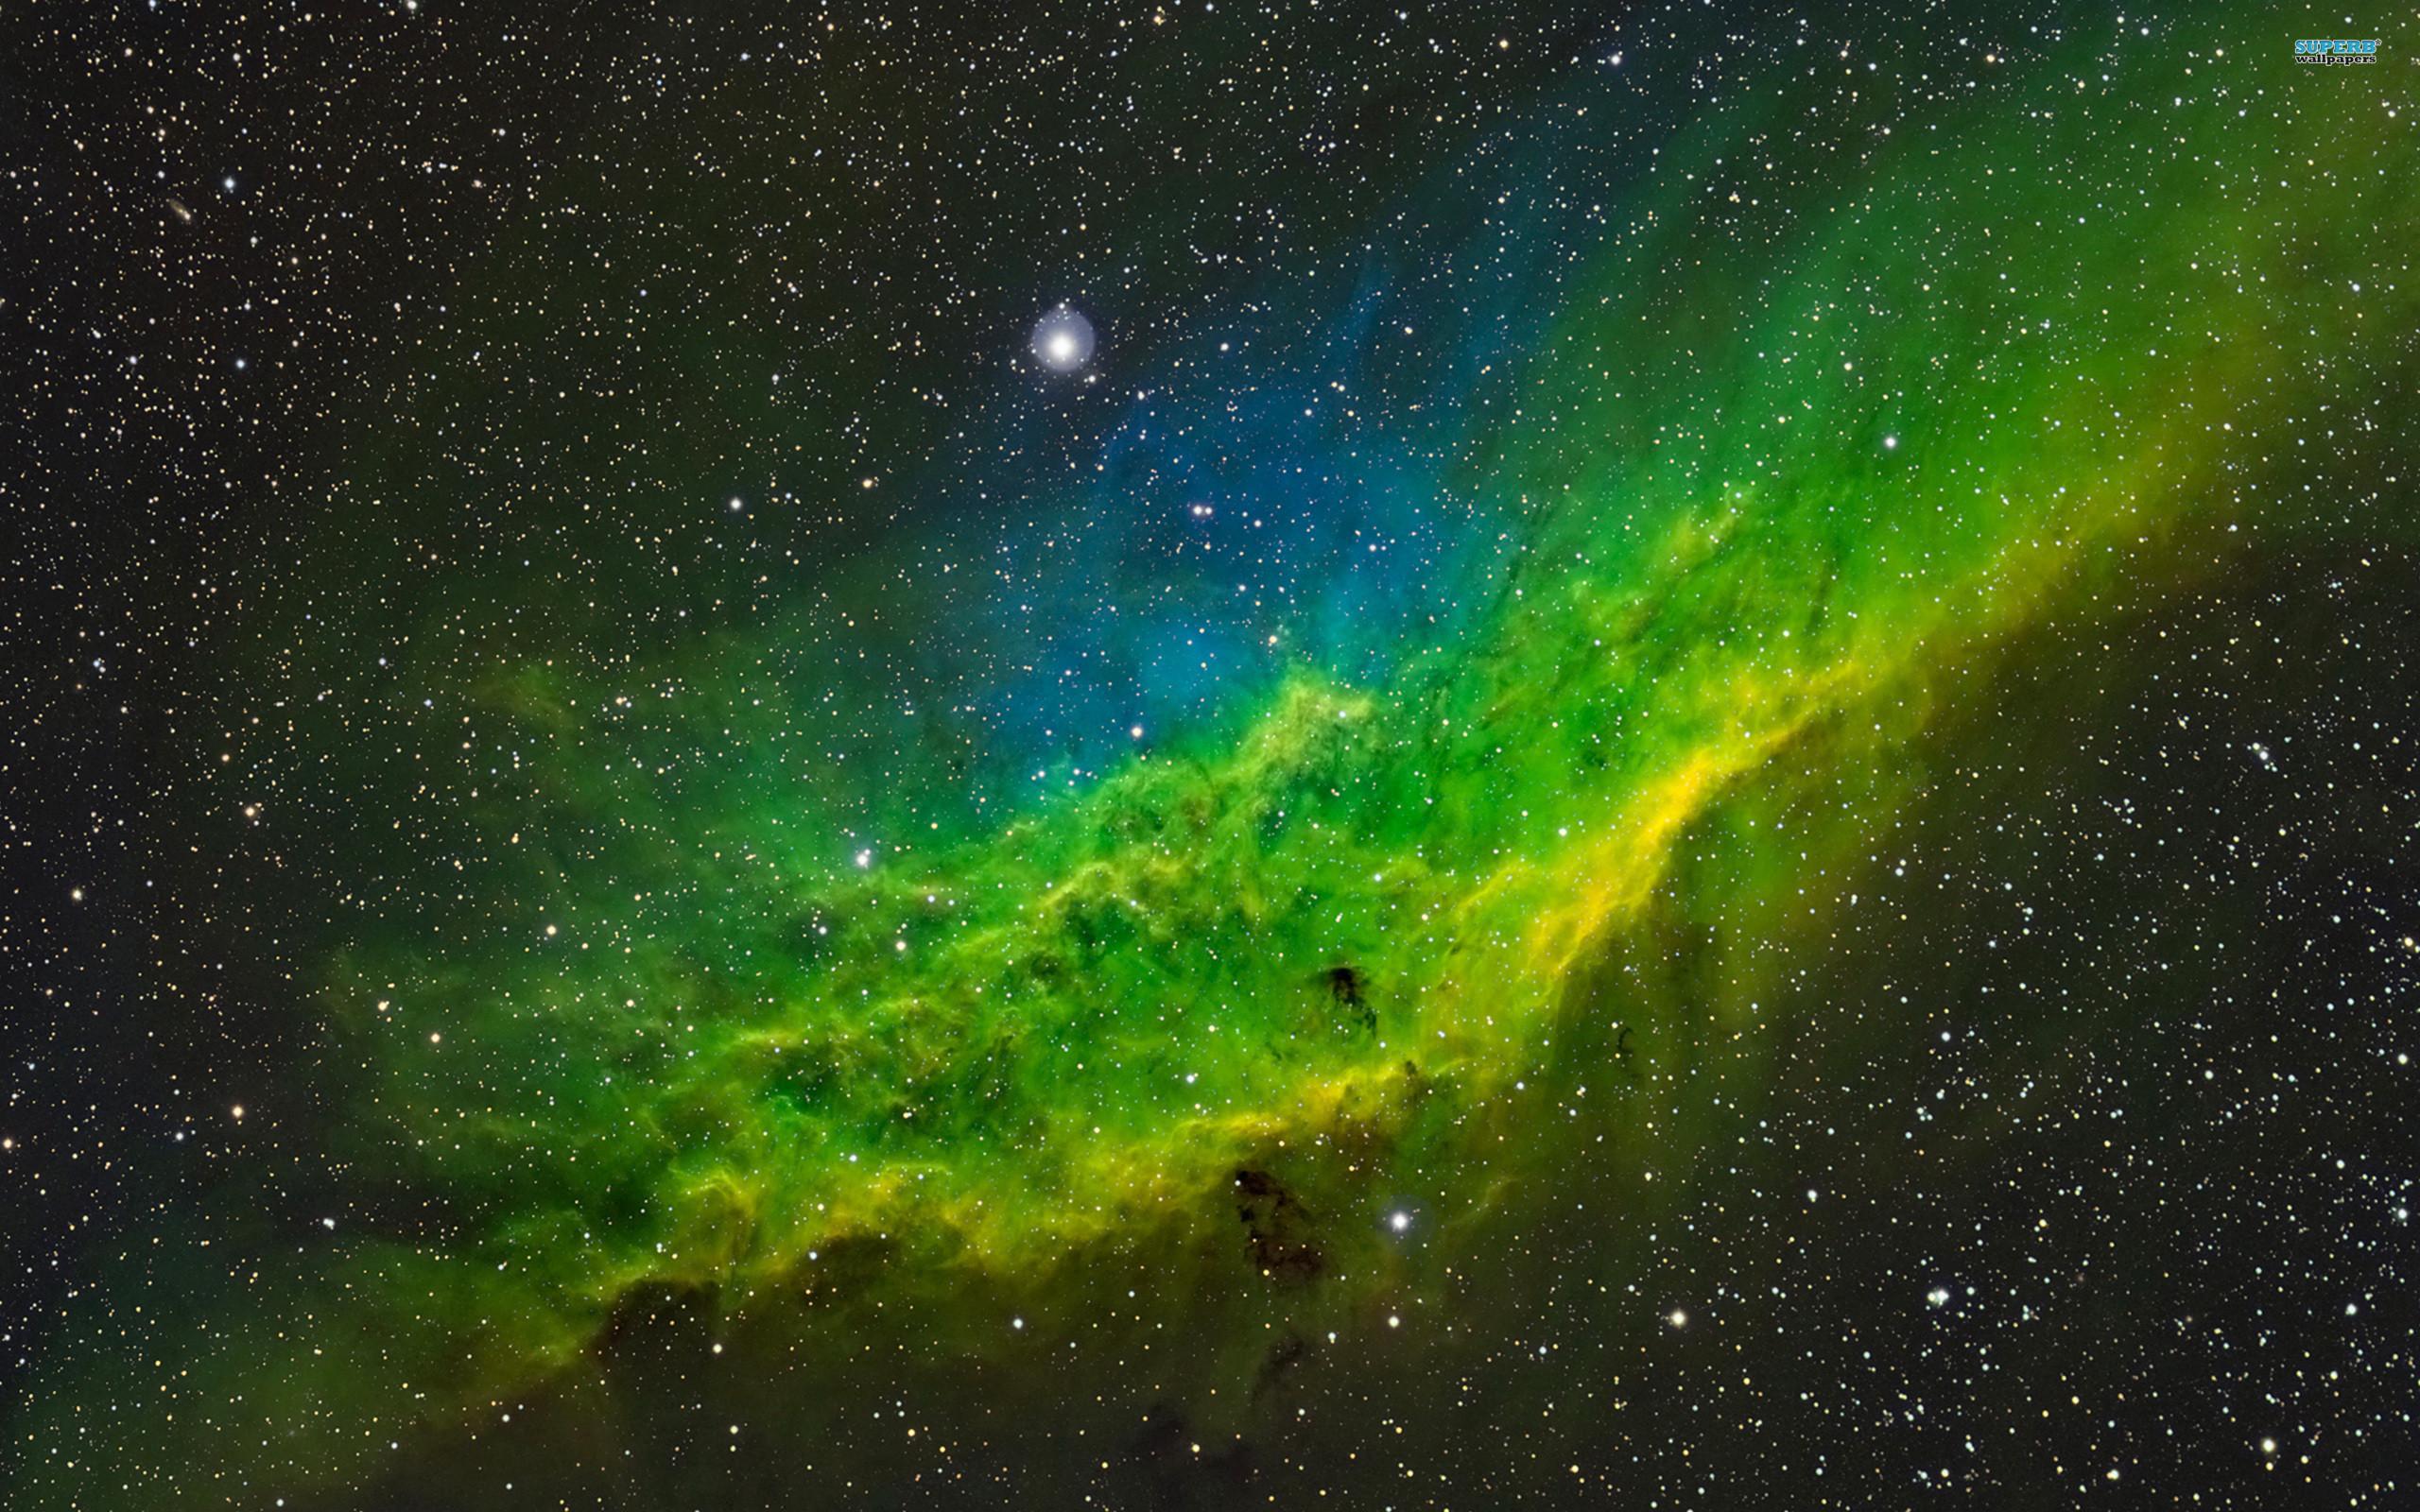 4k space nebula wallpaper